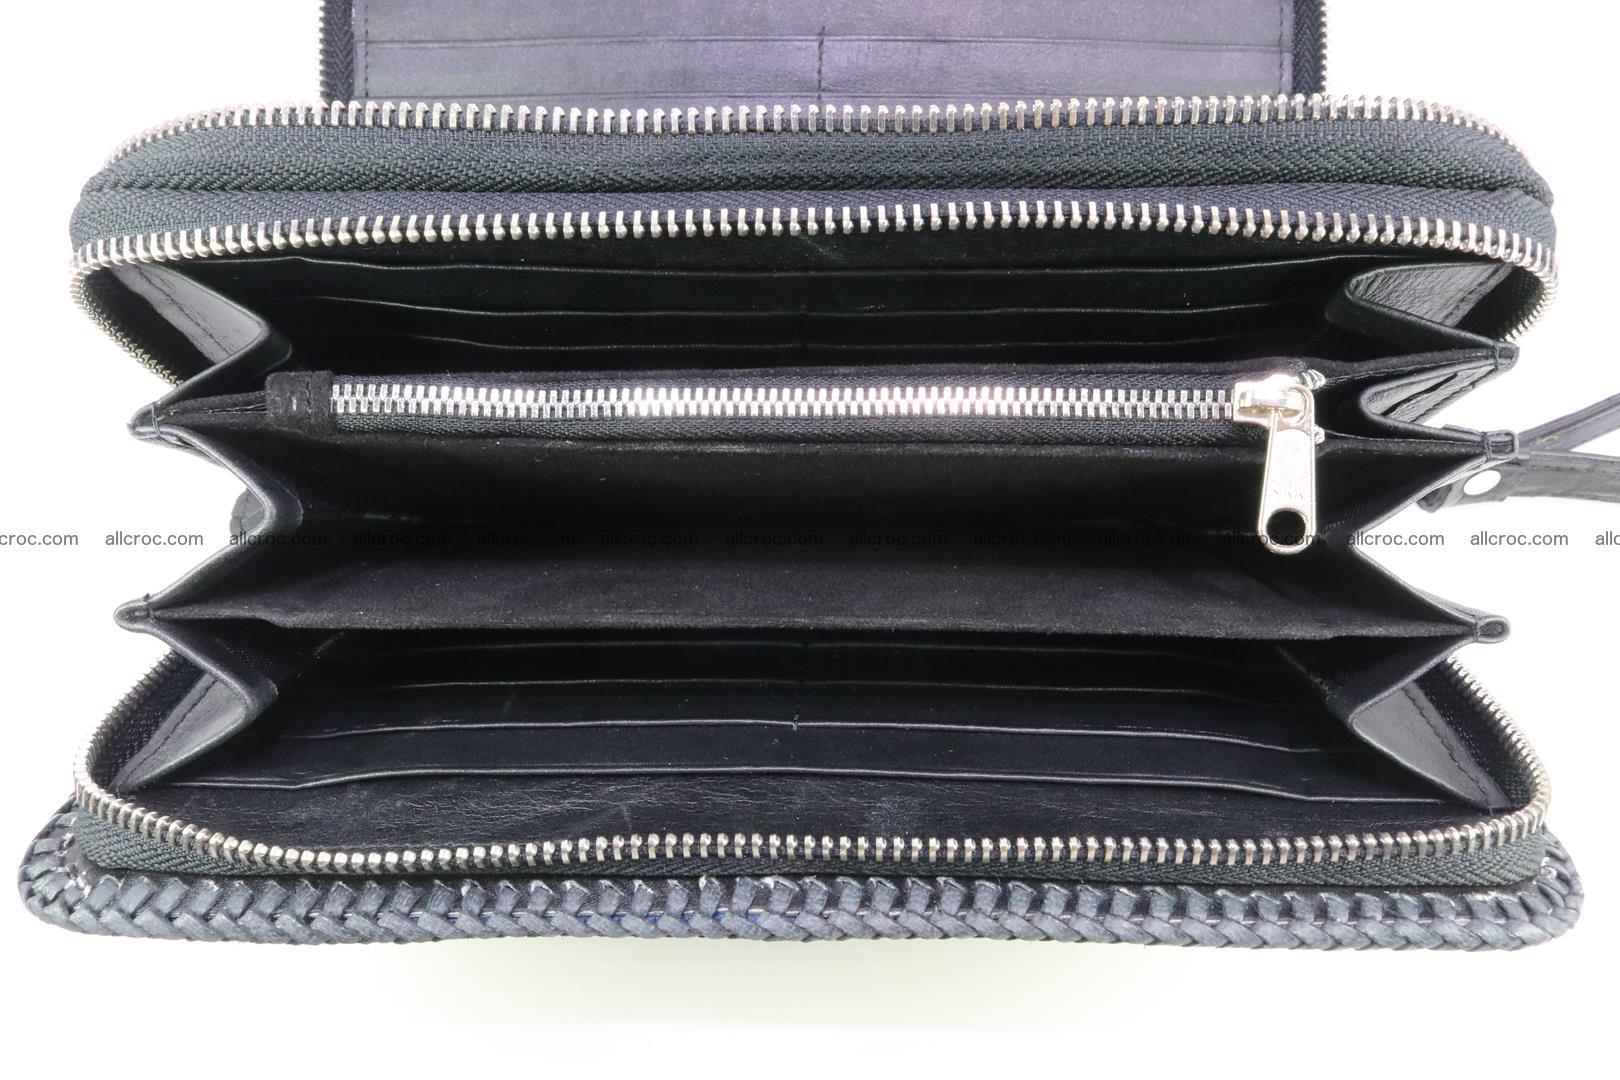 Crocodile clutch for men from genuine hornback crocodile leather 160 Foto 10